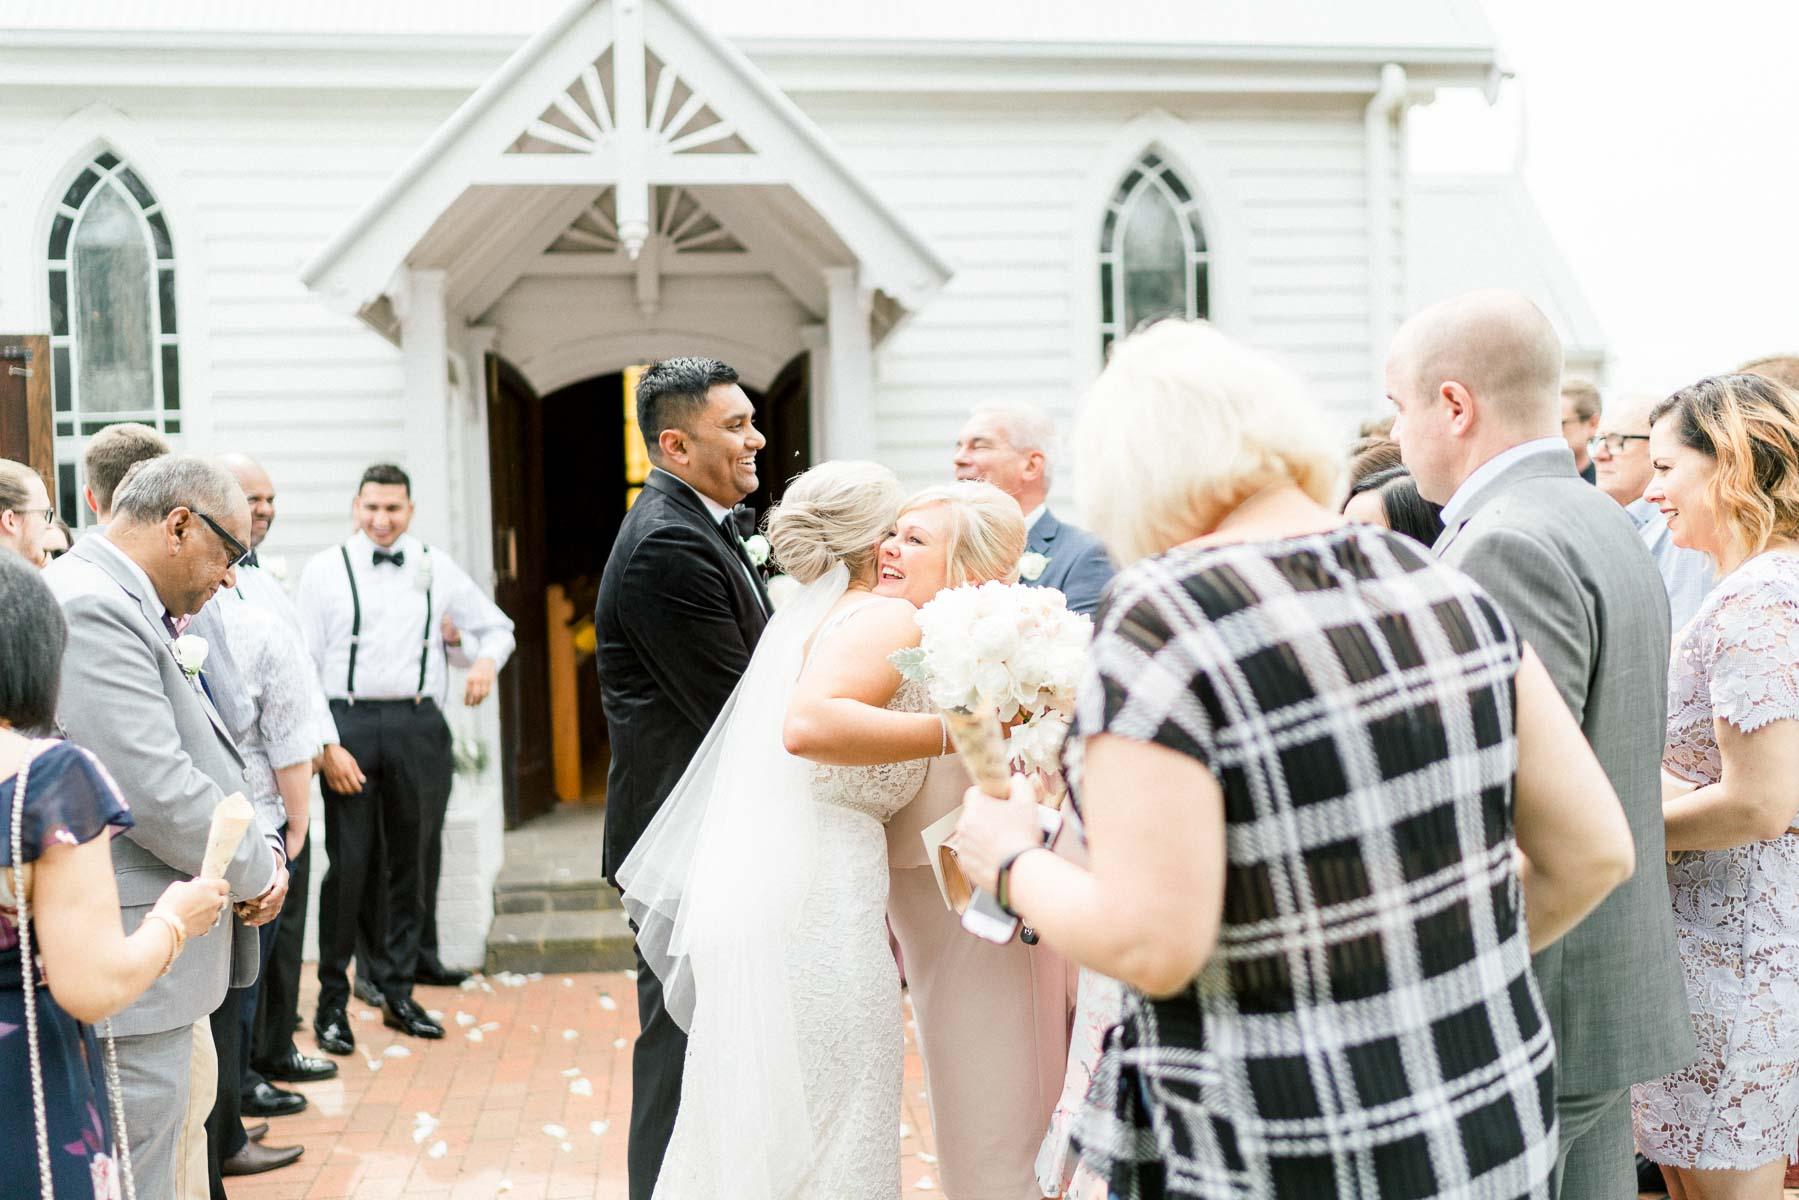 trenavin-chapel-phillip-island-wedding-heart+soul-weddings-sally-sean-00394.jpg